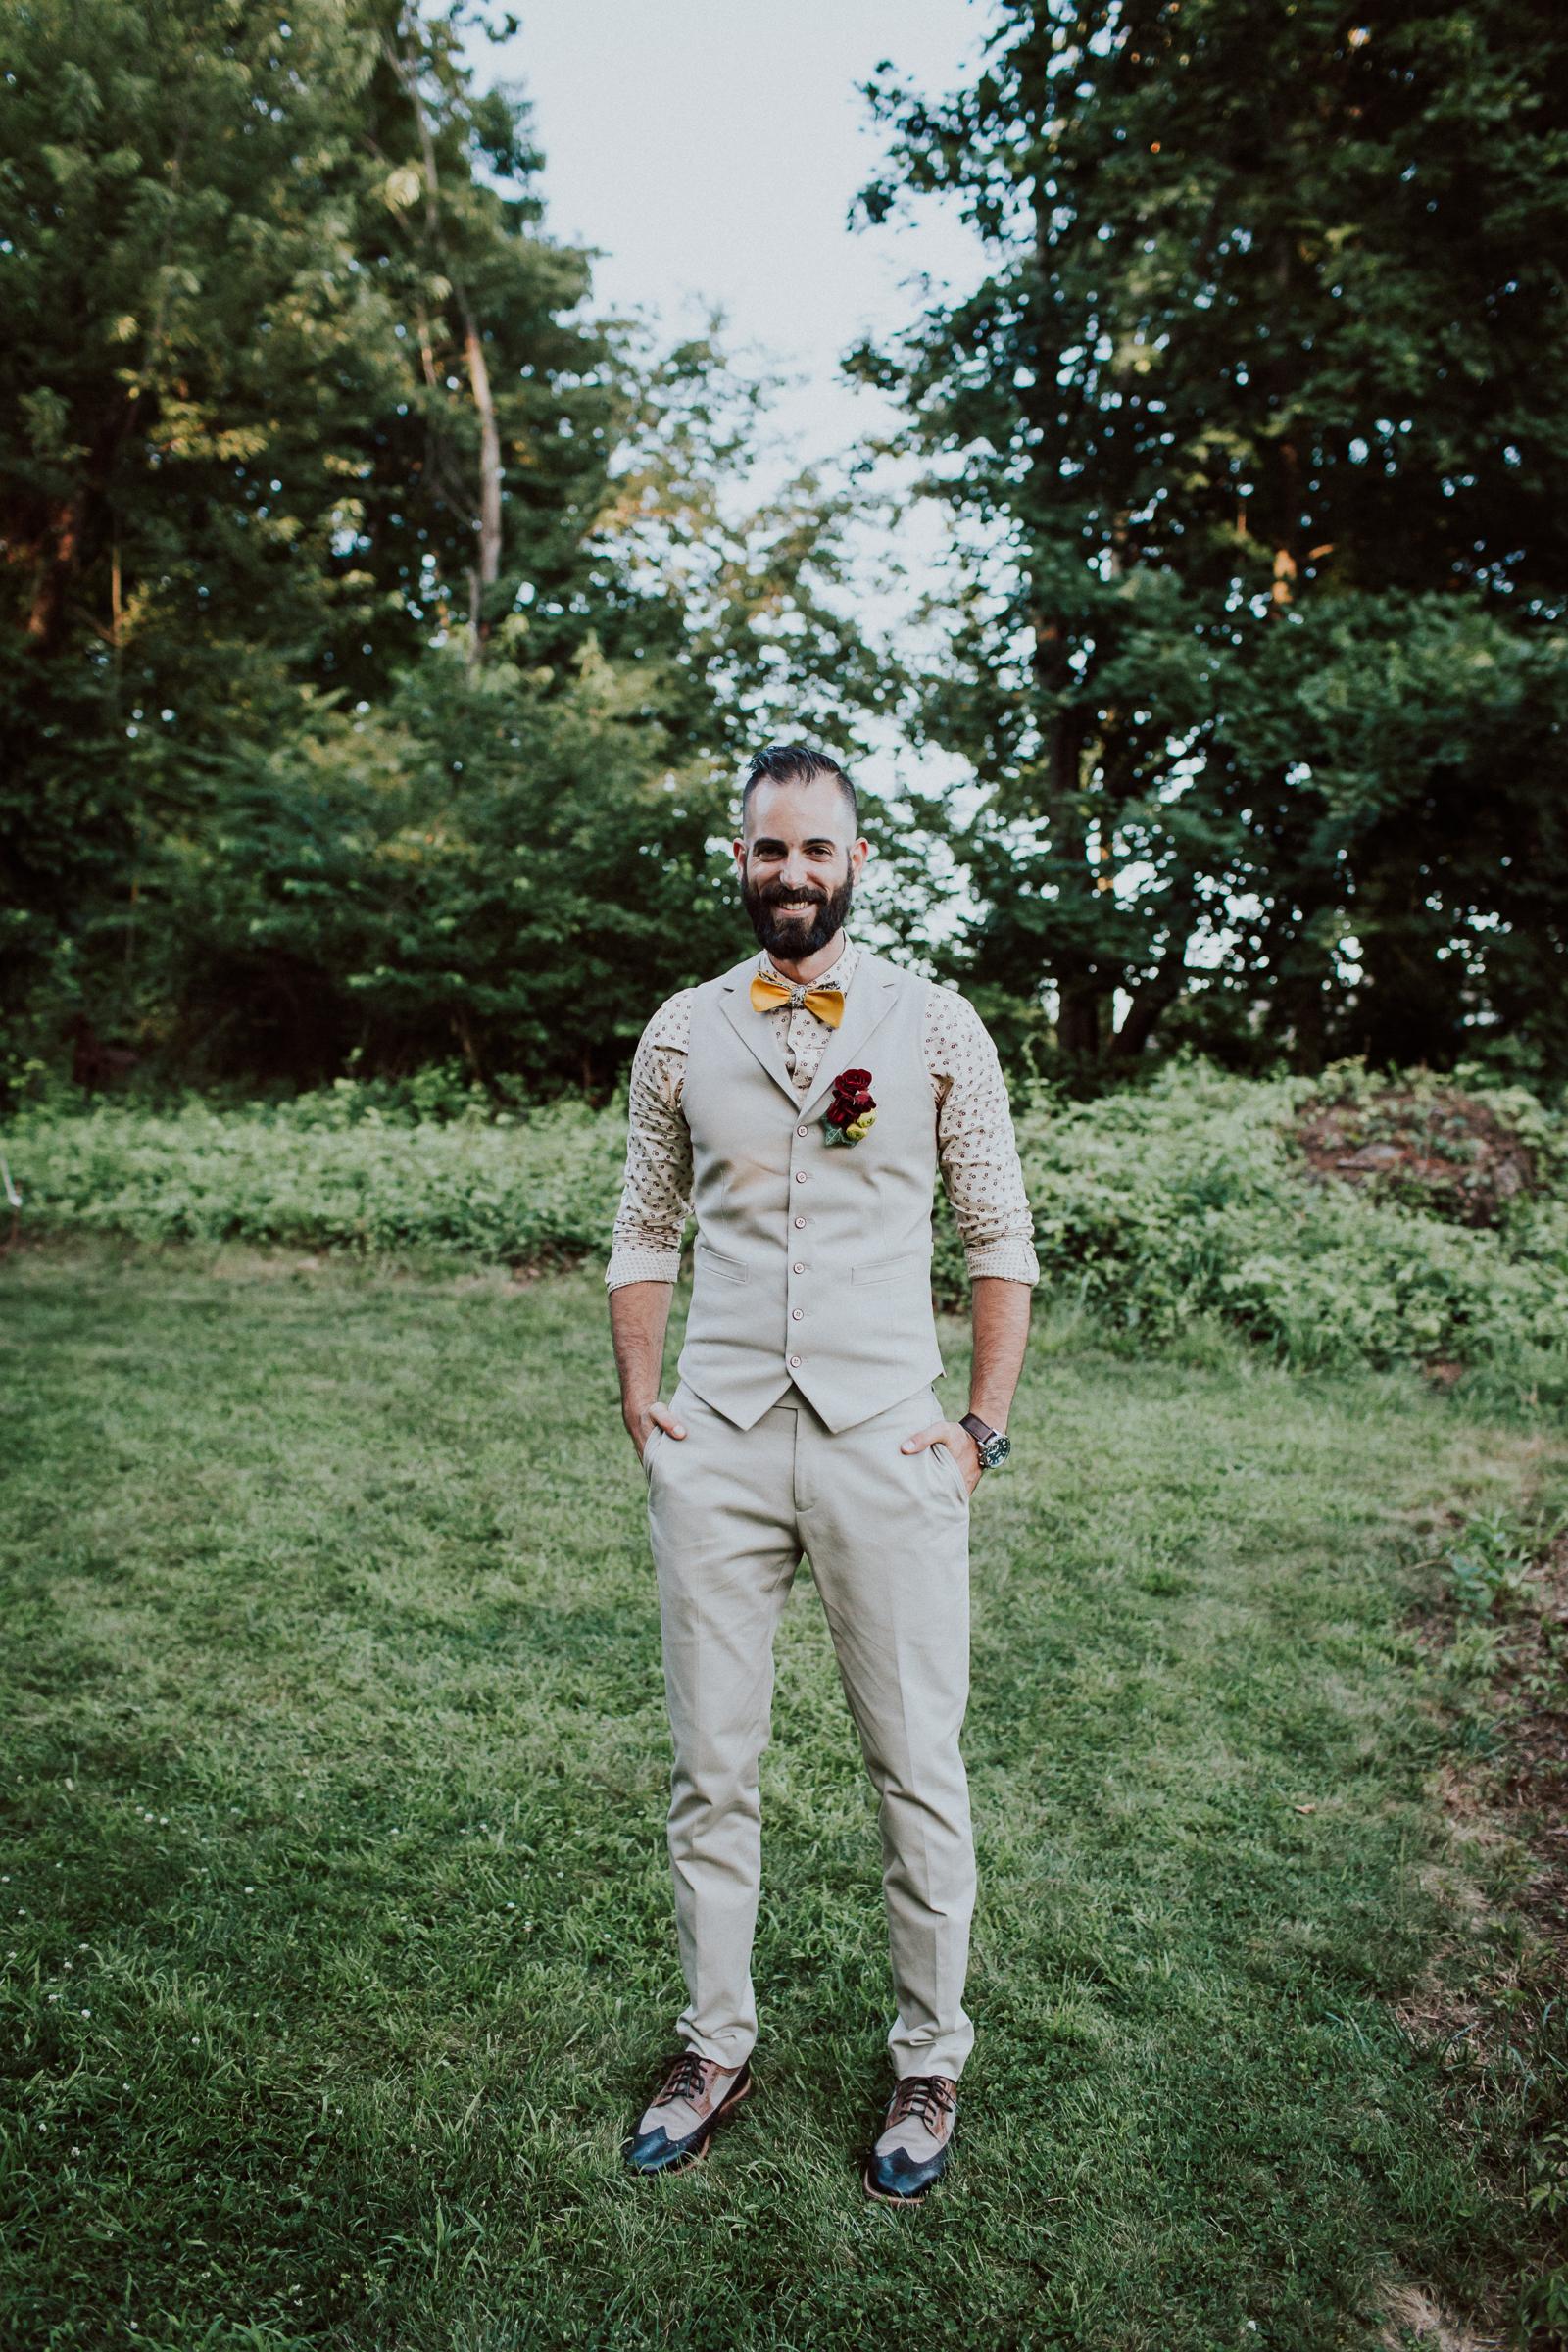 Backyard-Intimate-Adventurous-Destination-Wedding-Darien-Connecticut-Documentary-Wedding-Photography-96.jpg